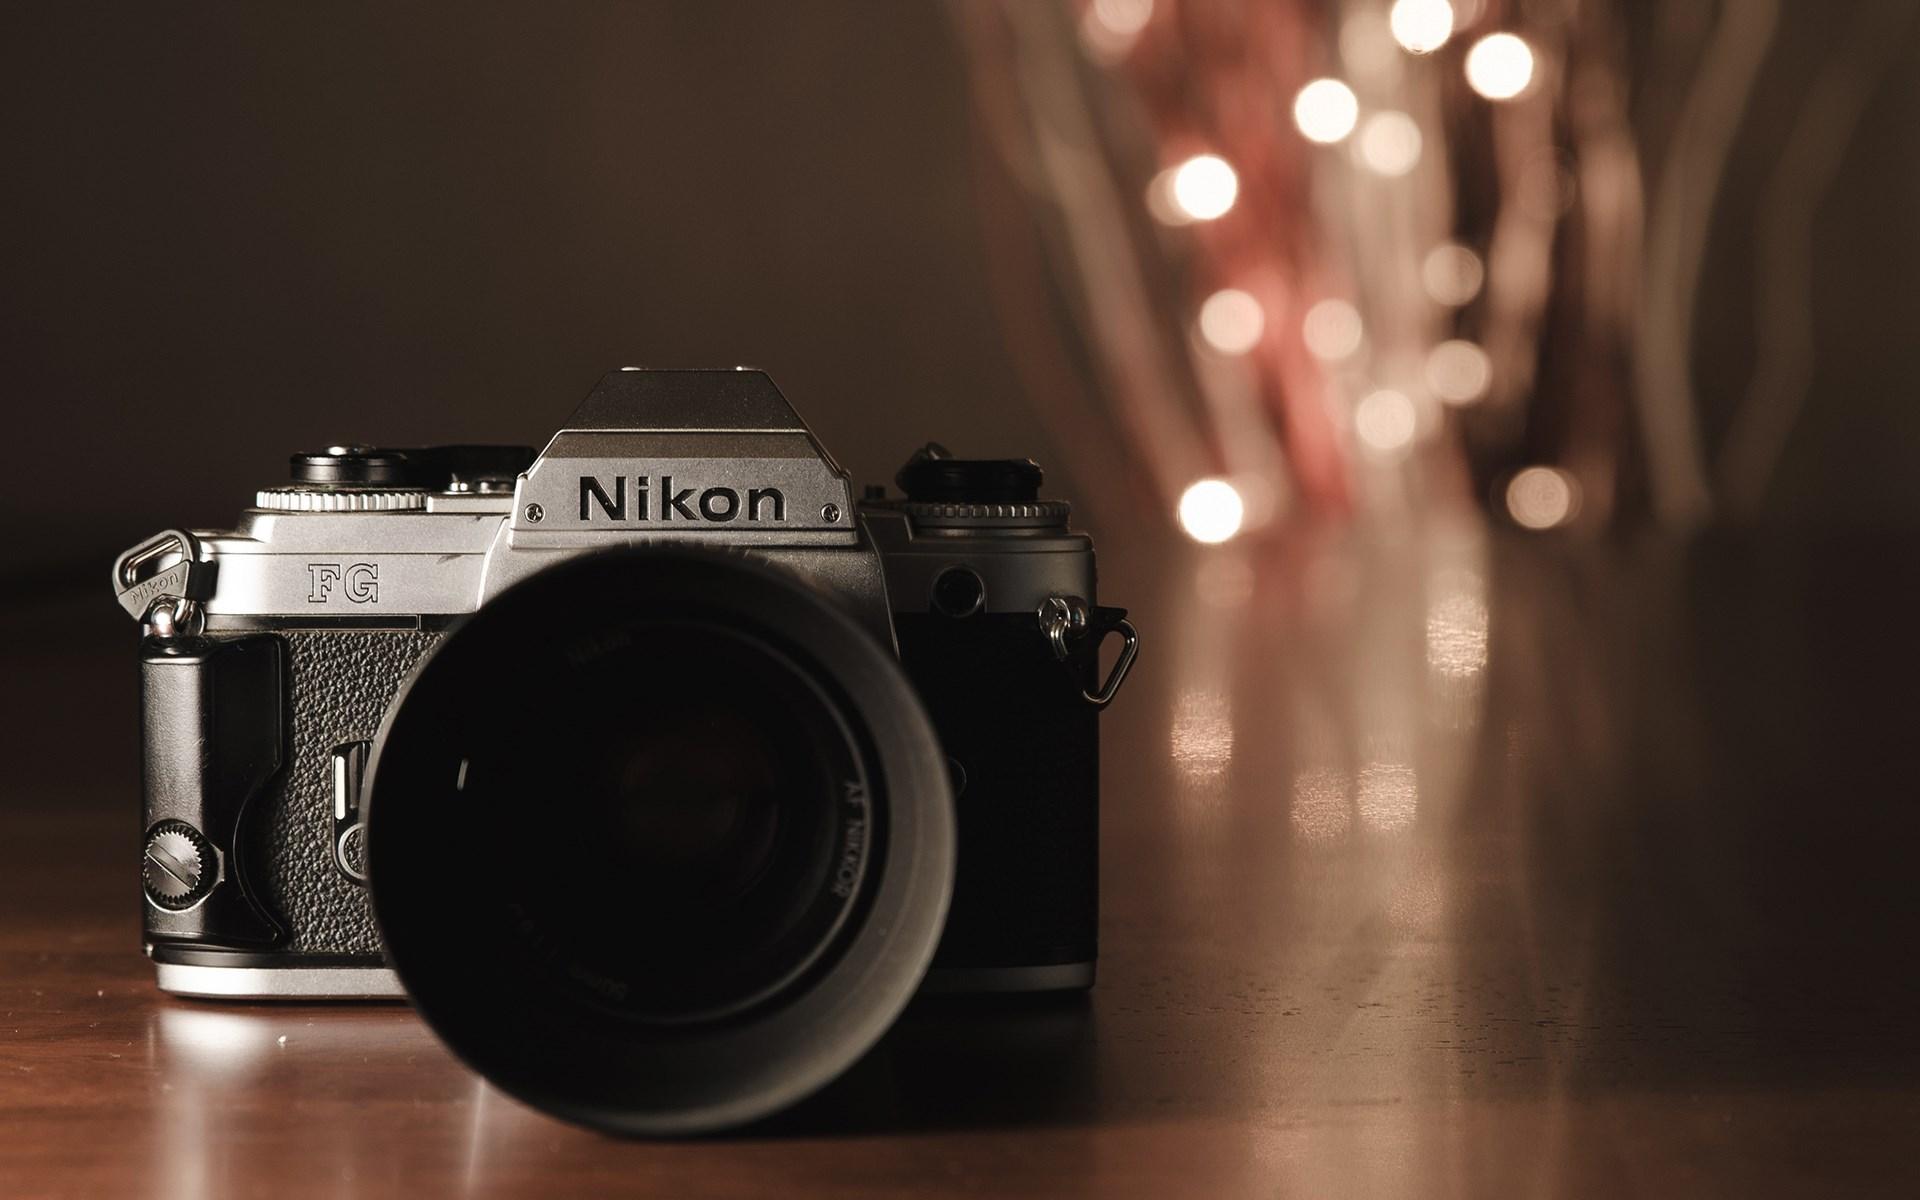 Awesome Nikon Wallpaper